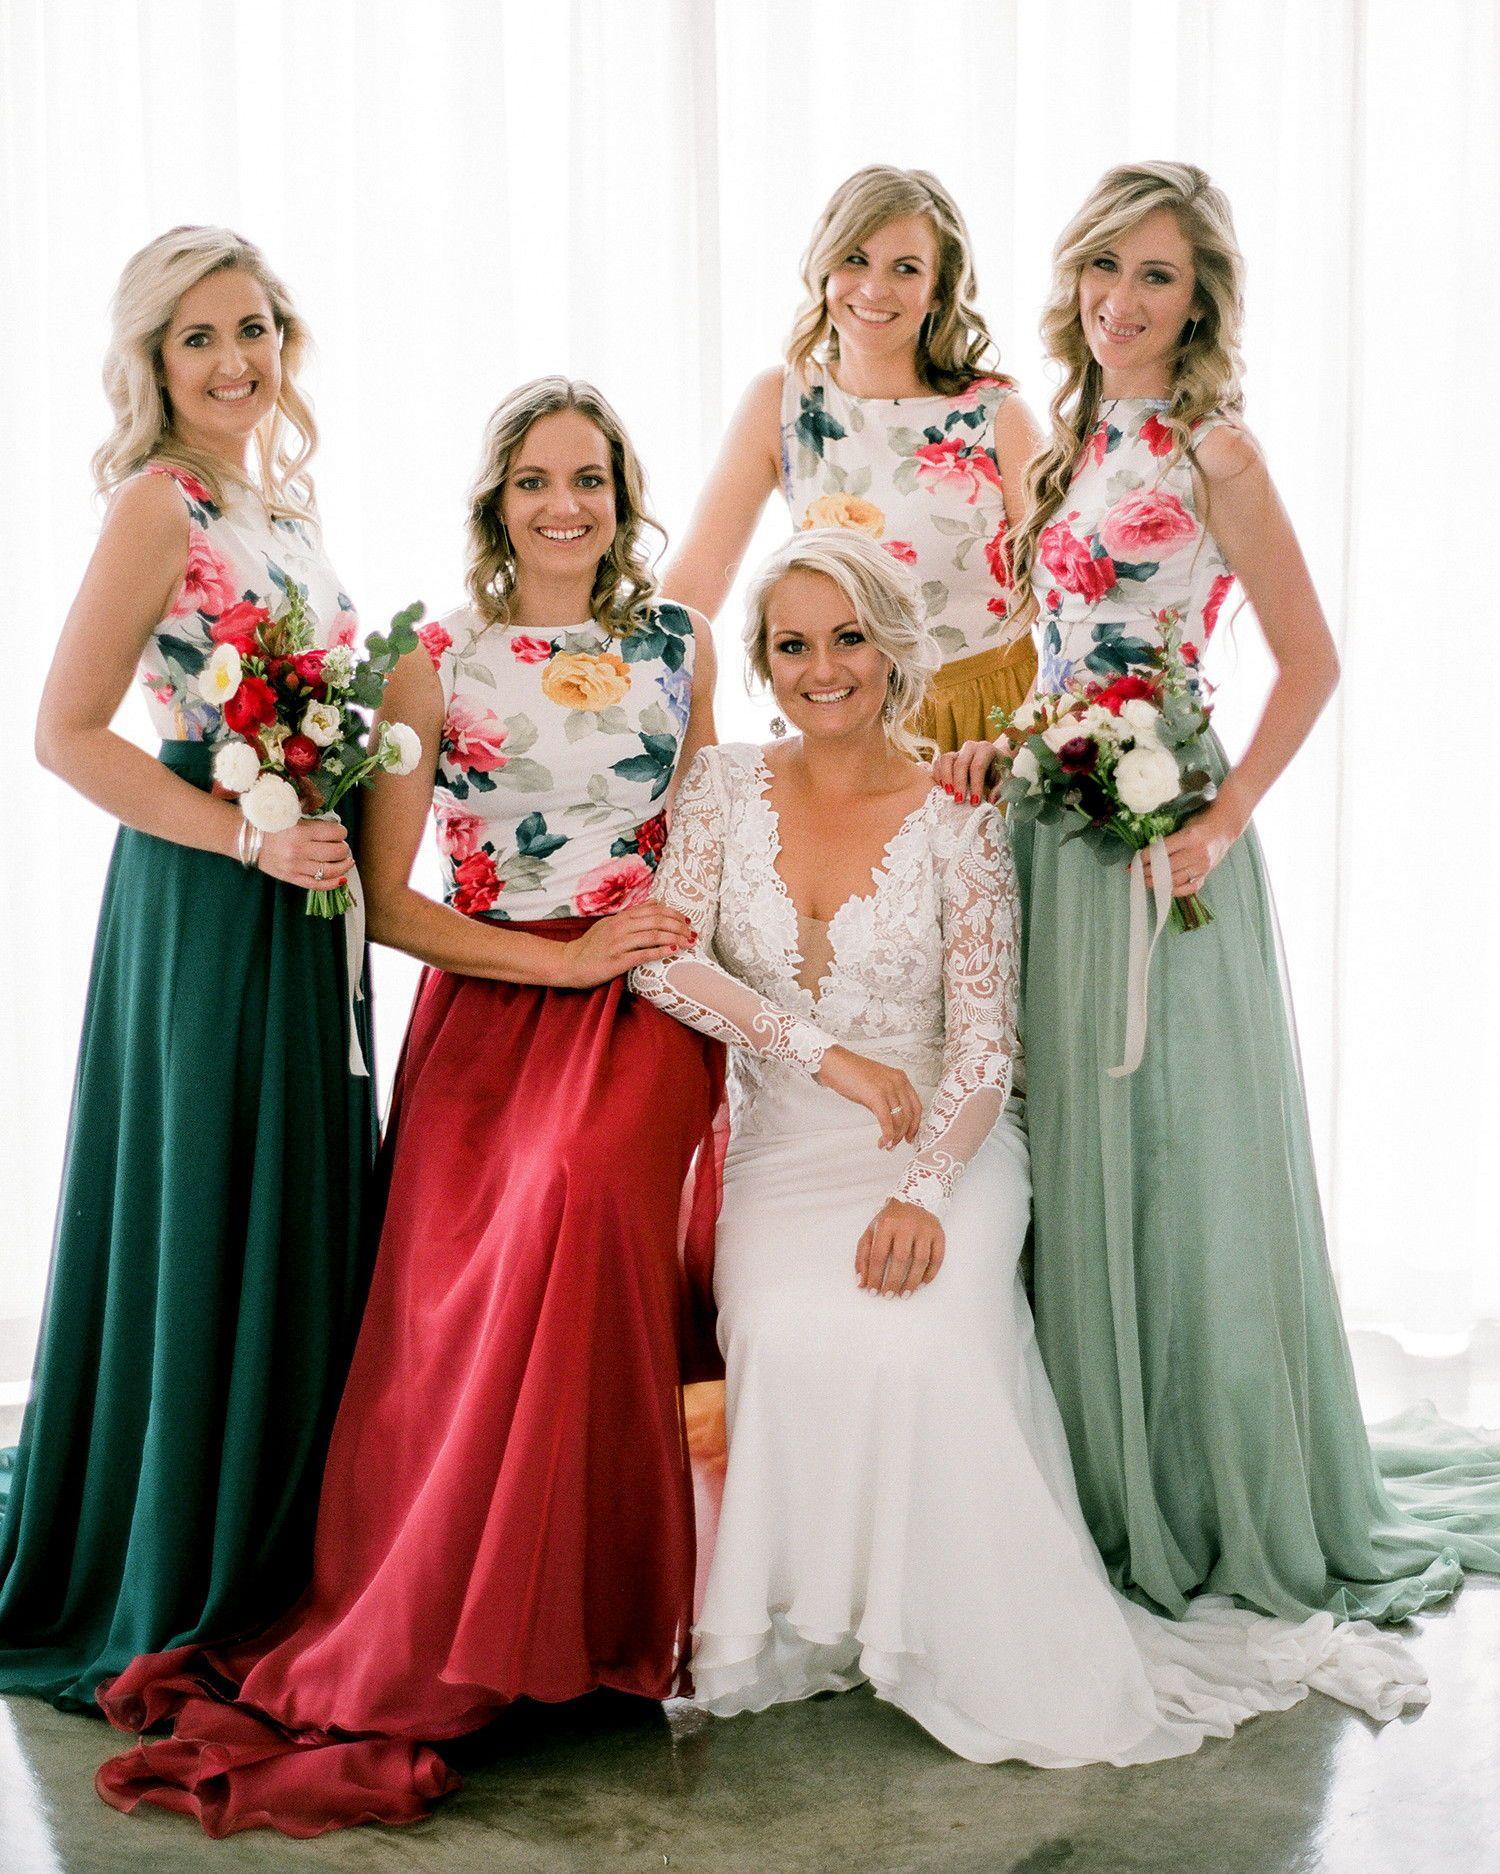 506f5501aa 25 Two-Piece Bridesmaids  Looks  BridesmaidDresses  WeddingInspiration   WeddingIdeas  TwoPieceBridesmaidDresses